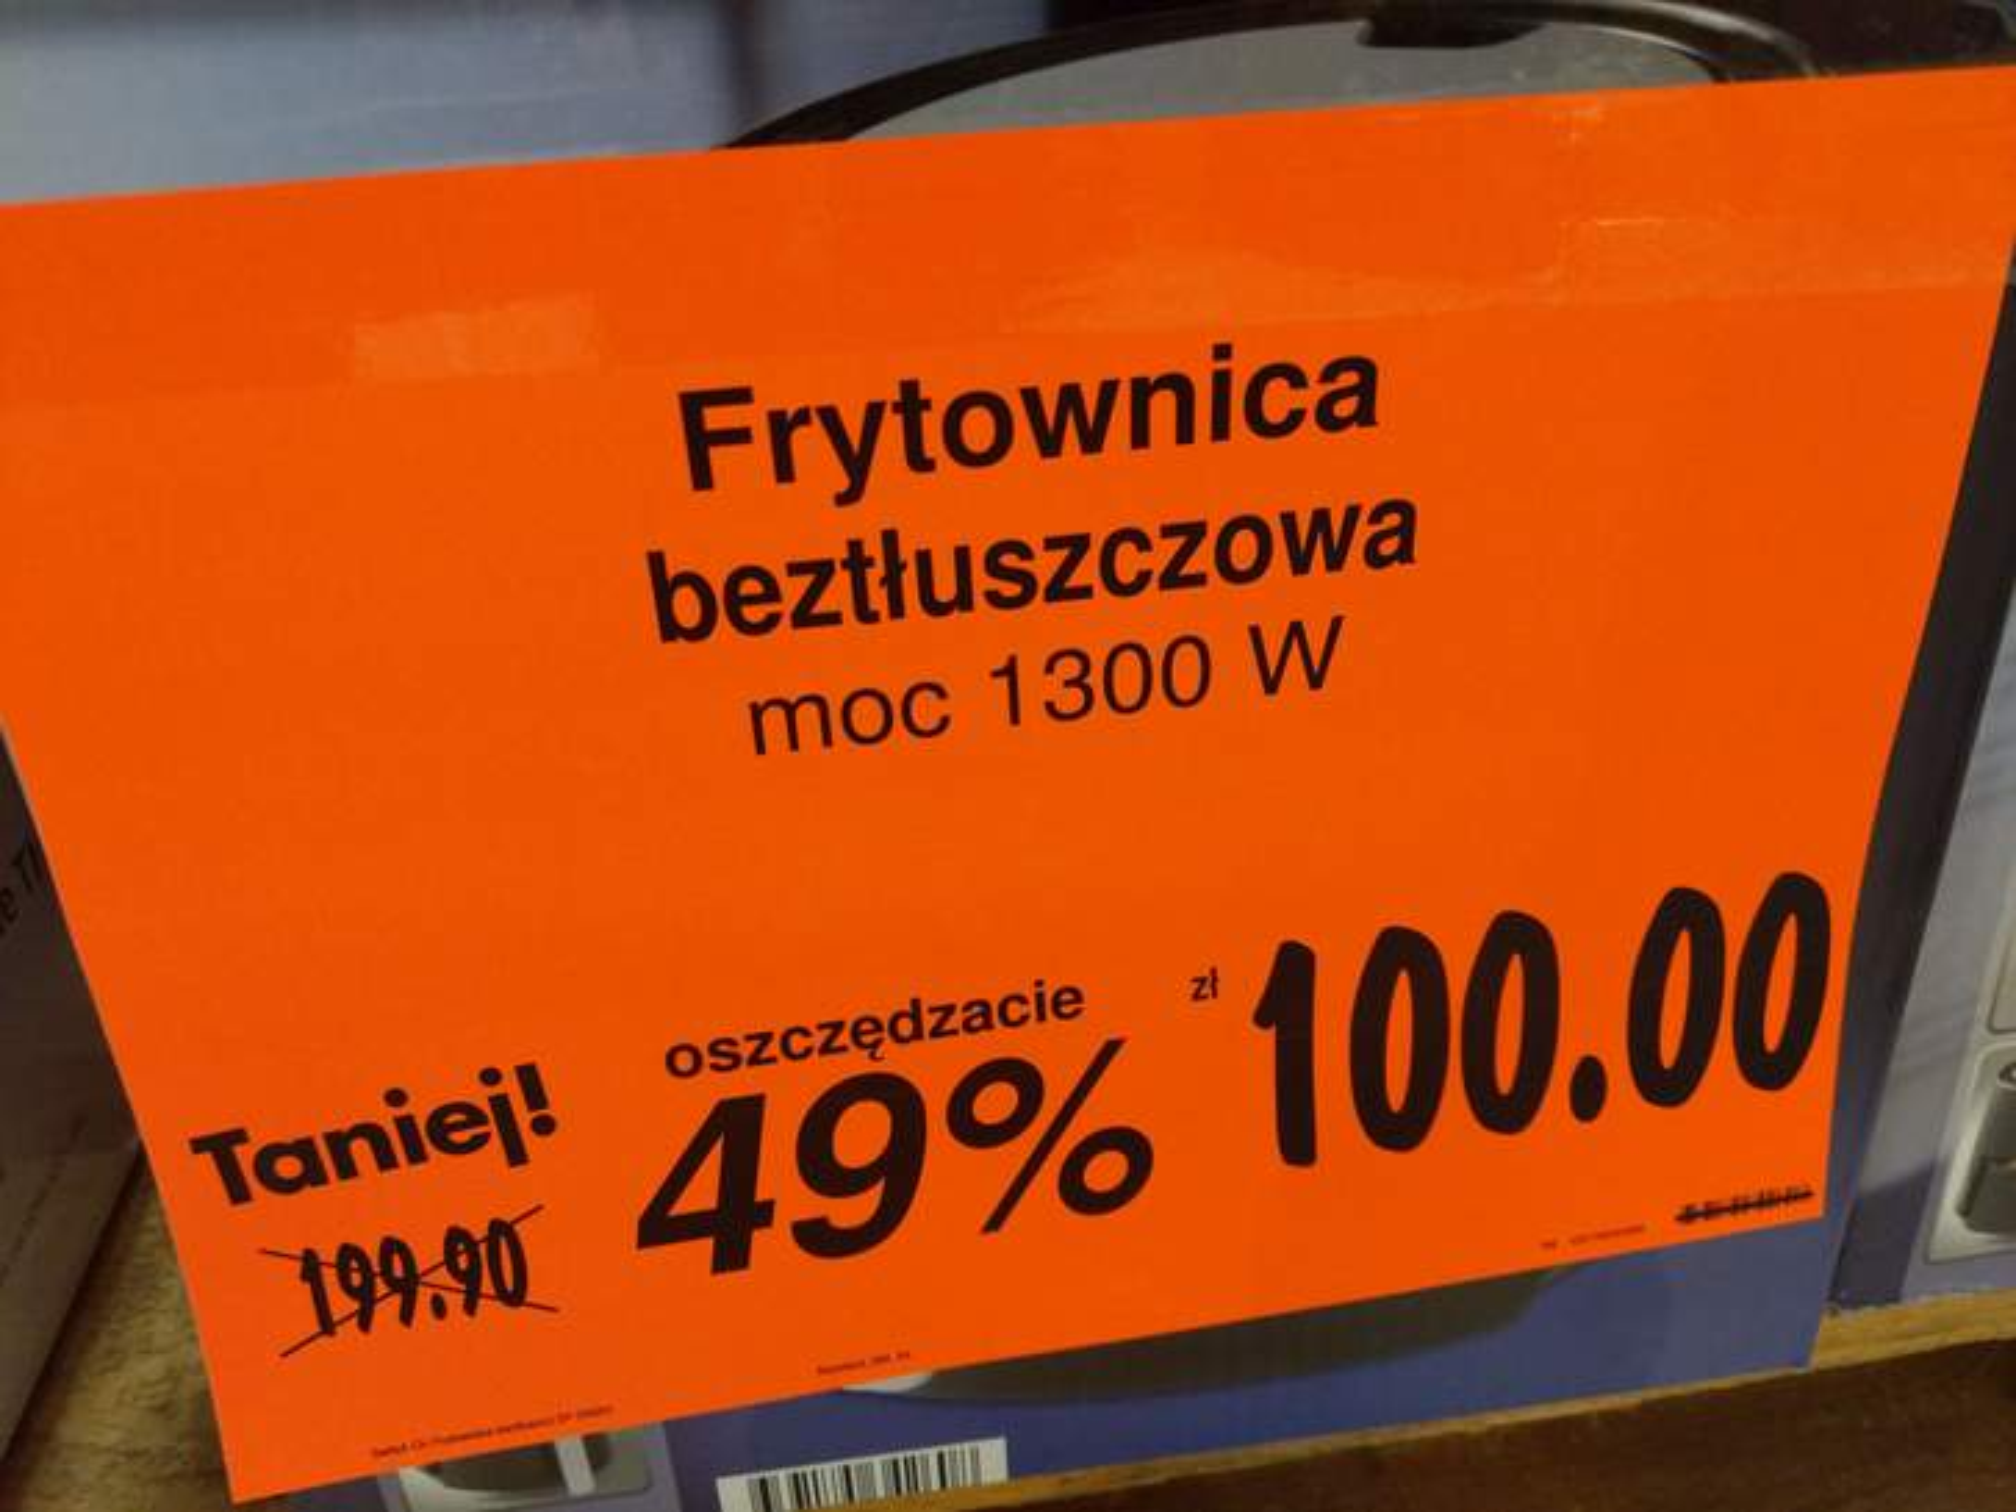 Frytkownica switch on Kaufland Pepper.pl